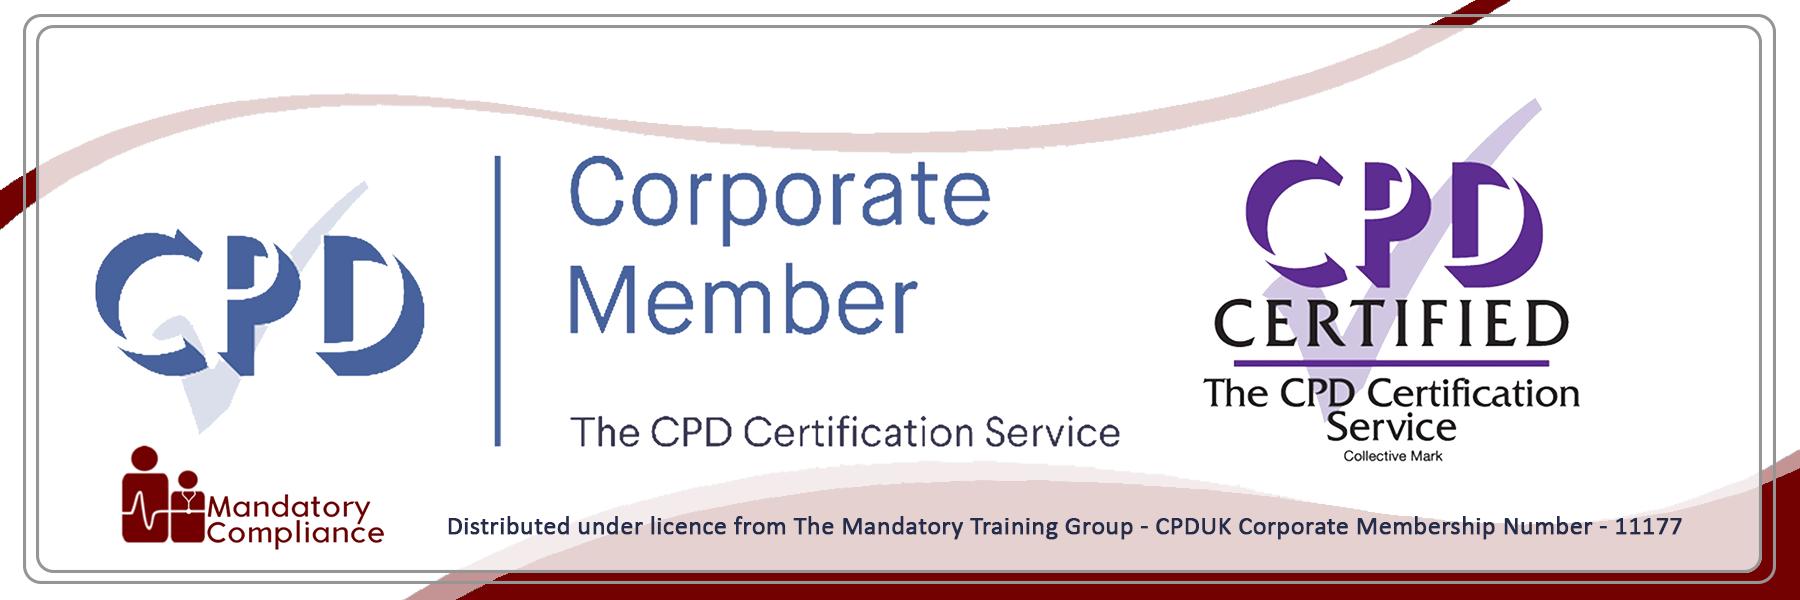 Mental Capacity Act - Online Training Courses - Mandatory Compliance UK-